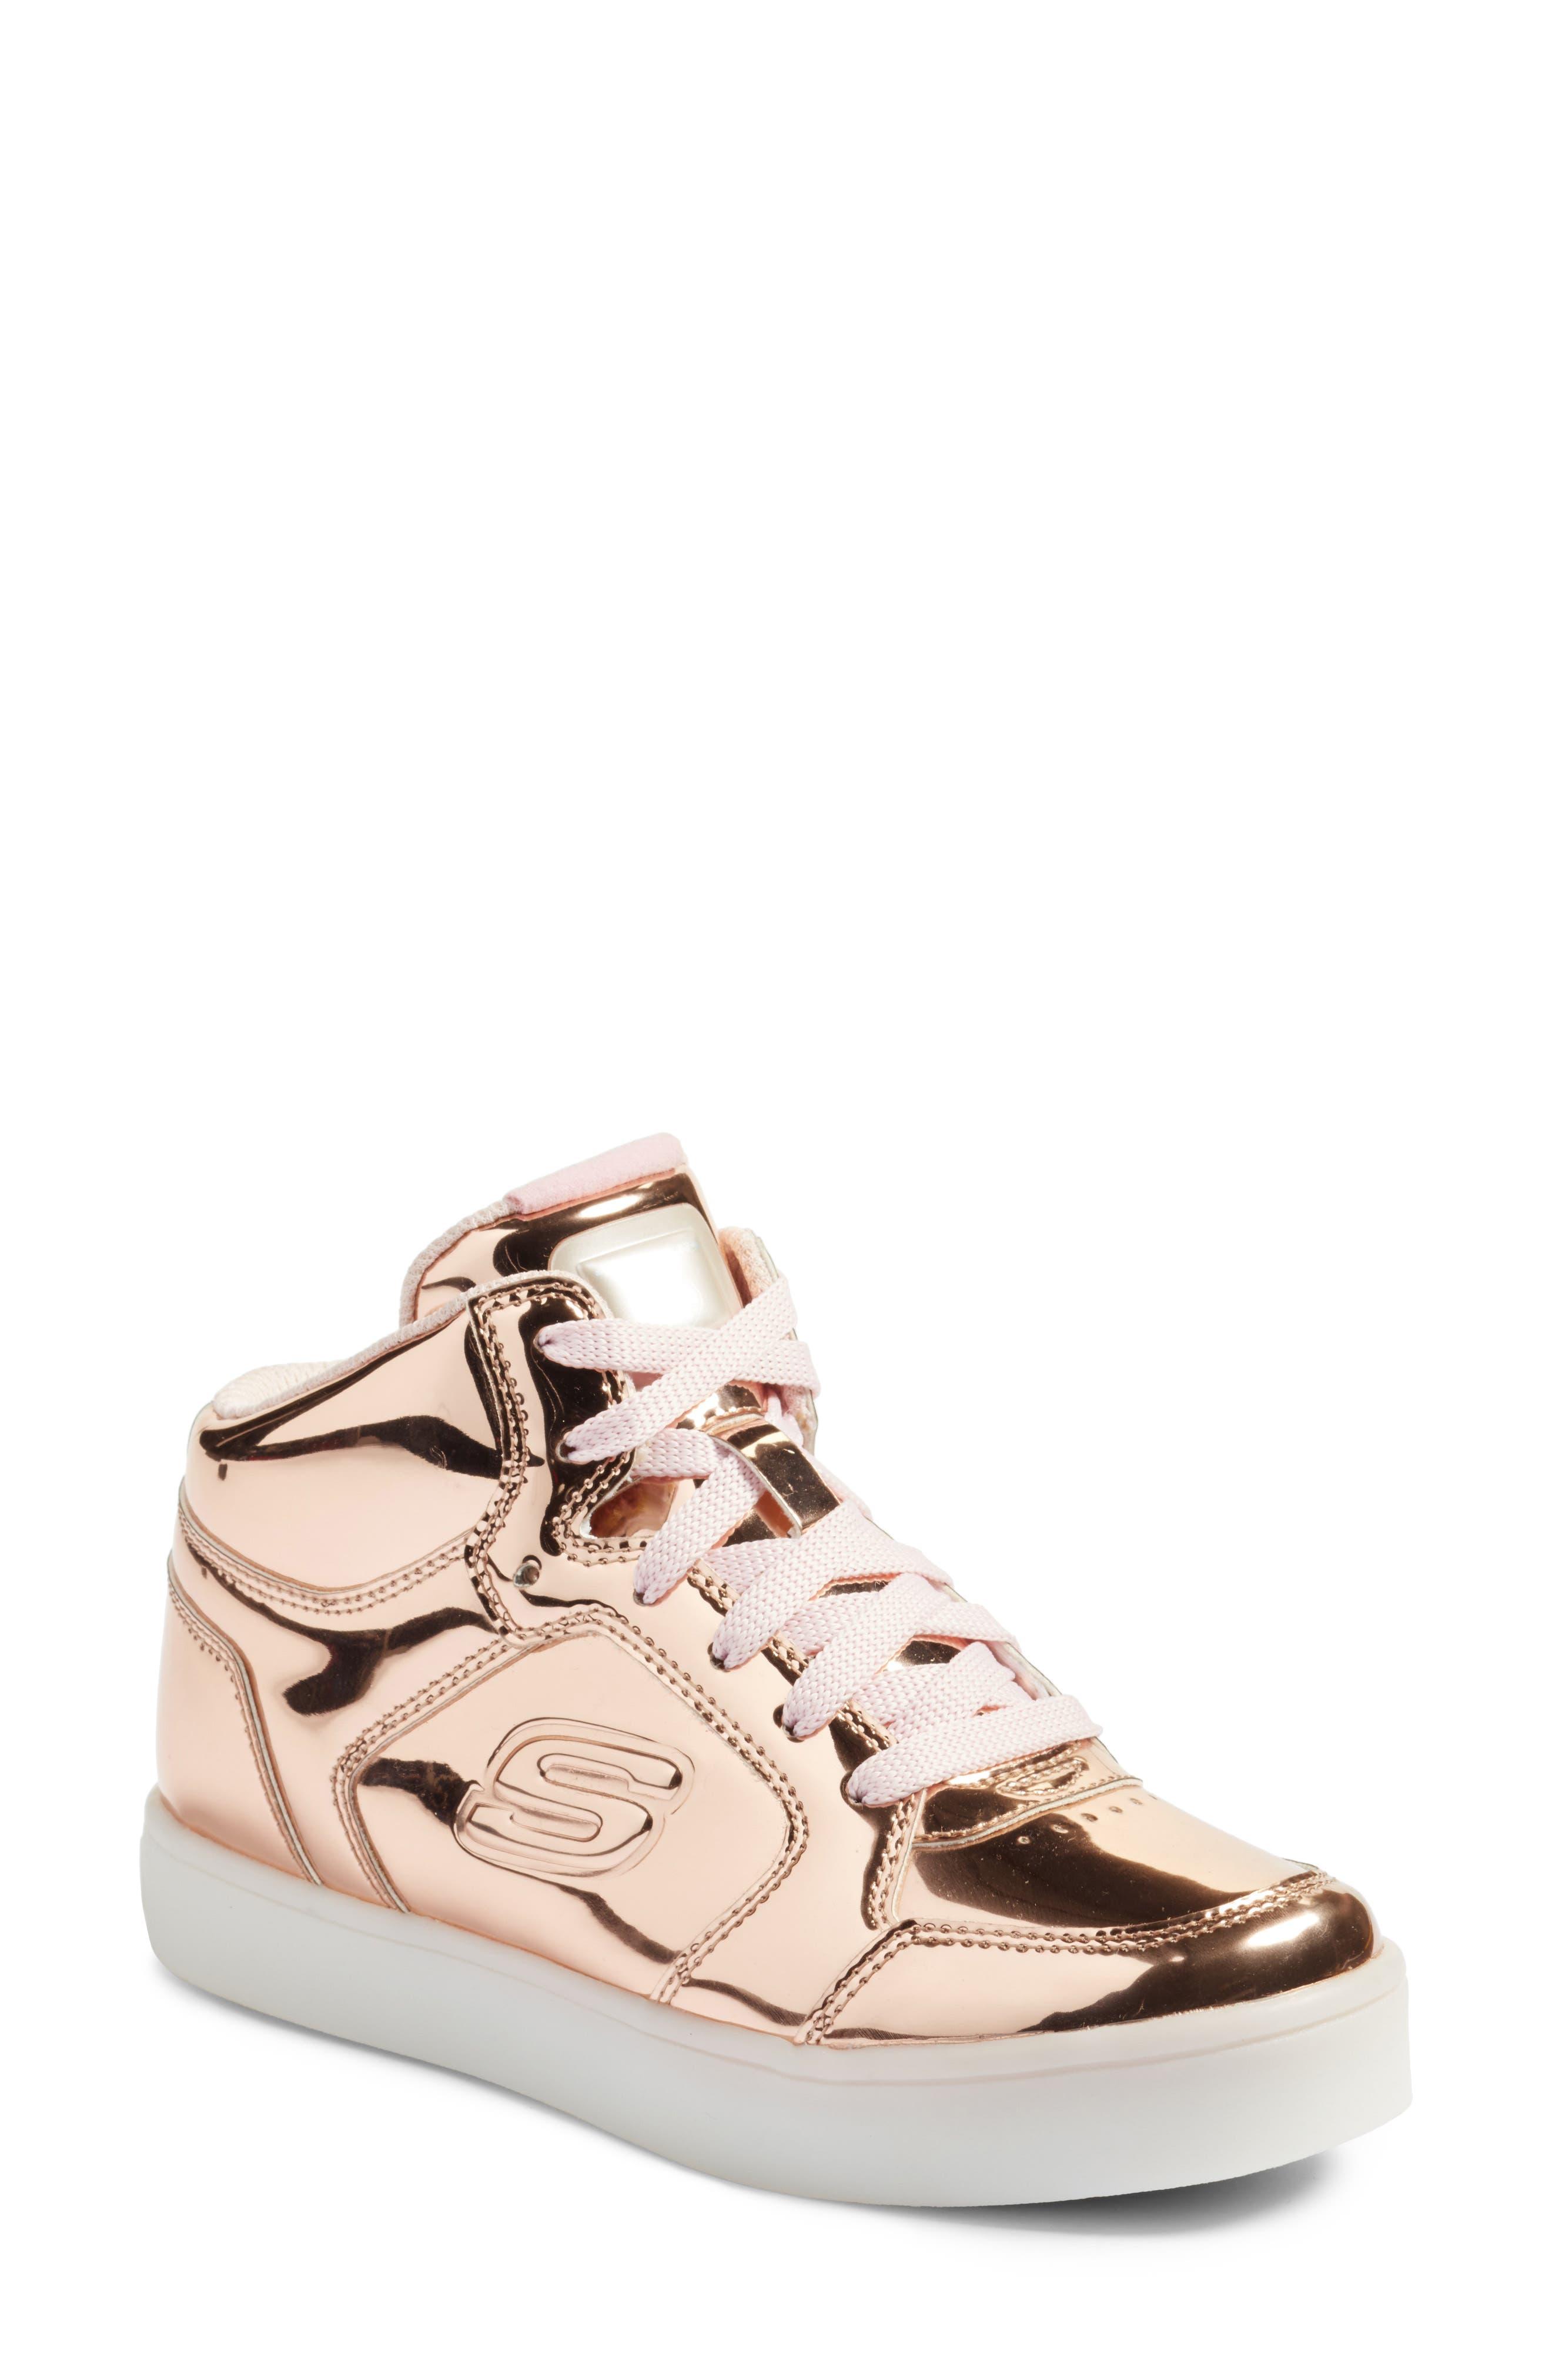 Energy Lights Metallic High Top Sneaker,                             Alternate thumbnail 6, color,                             Rose Gold